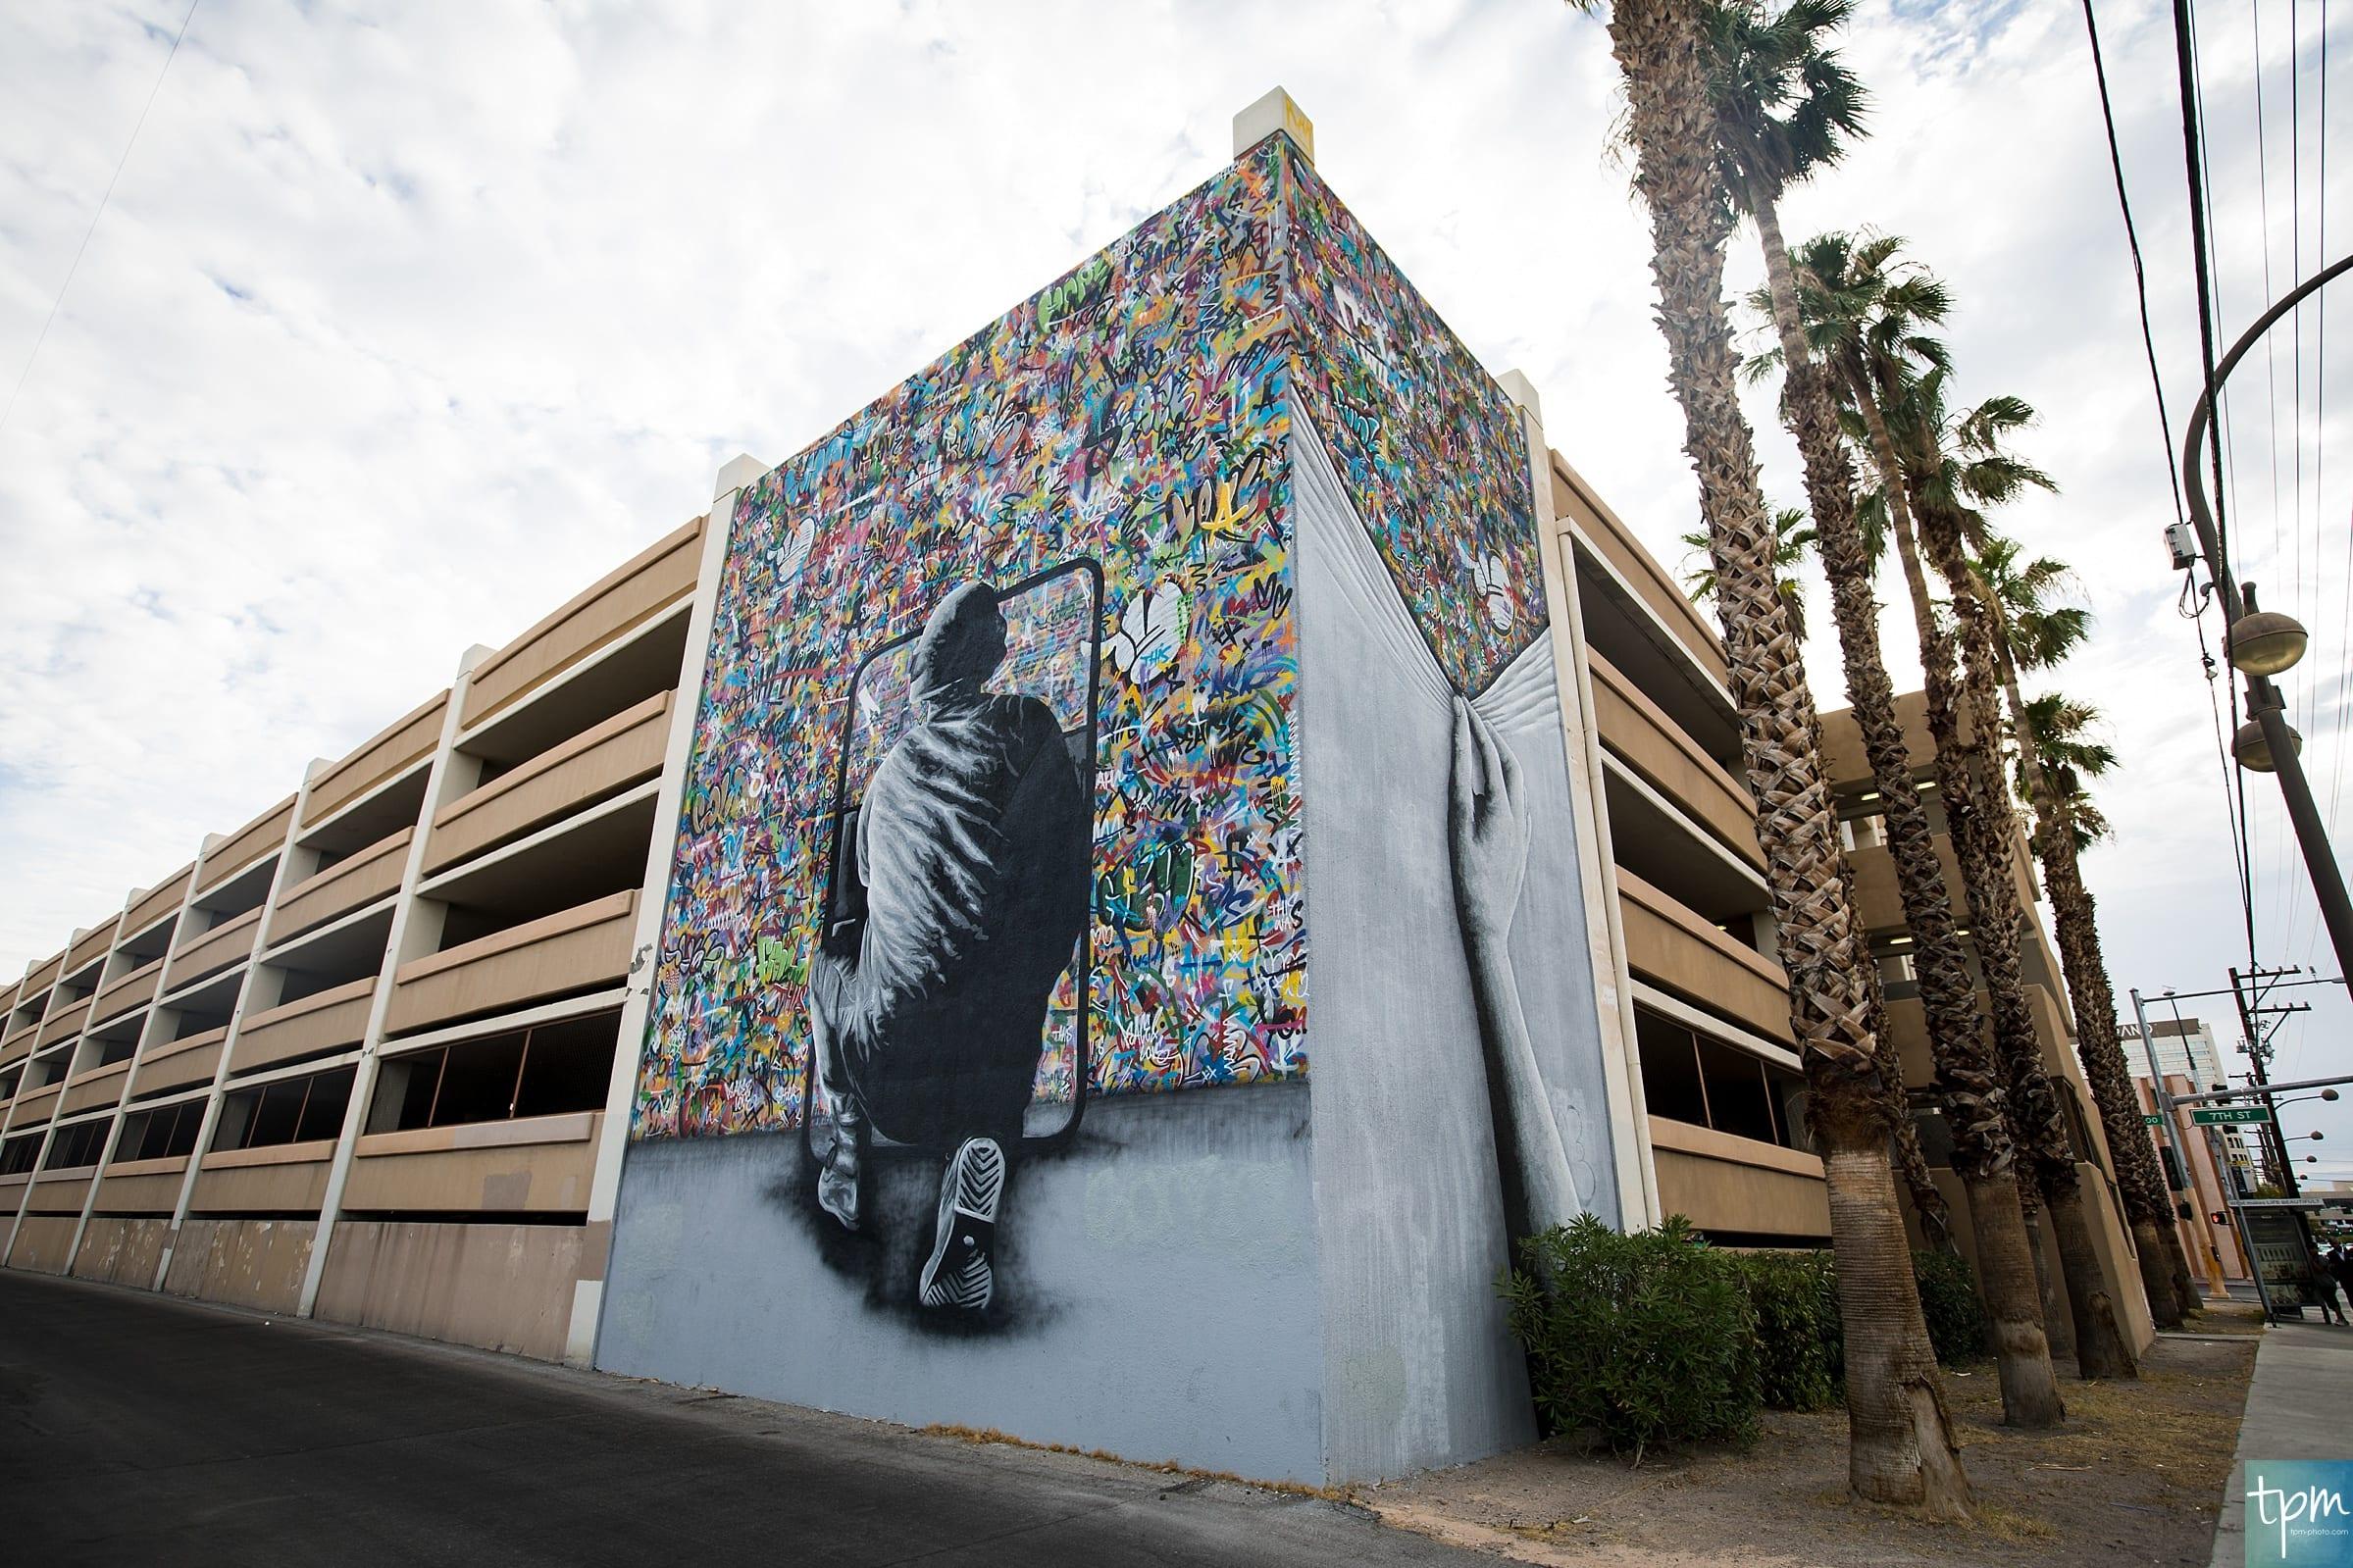 Martin Whatson, Cortez Parking Garage, Taylored Photo Memories, Las Vegas Murals